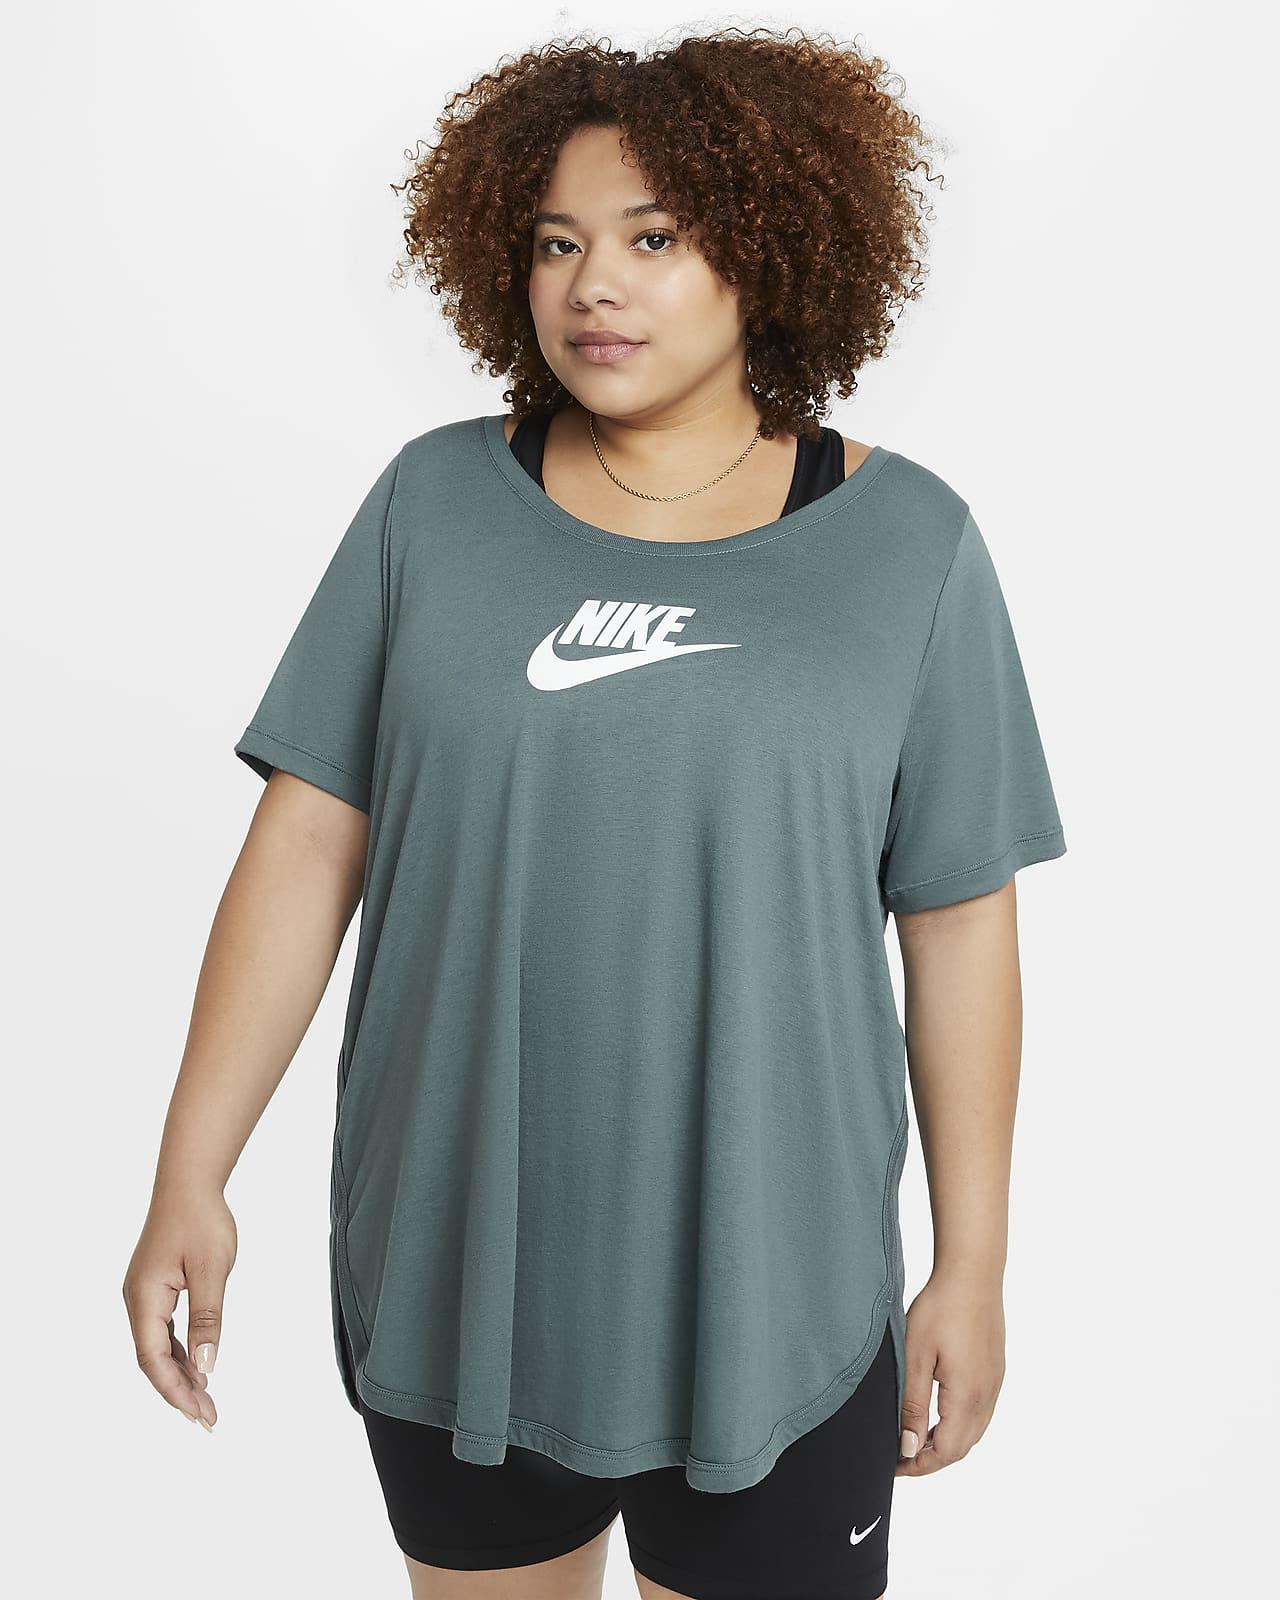 Playera larga para mujer (talla grande) Nike Sportswear Essential